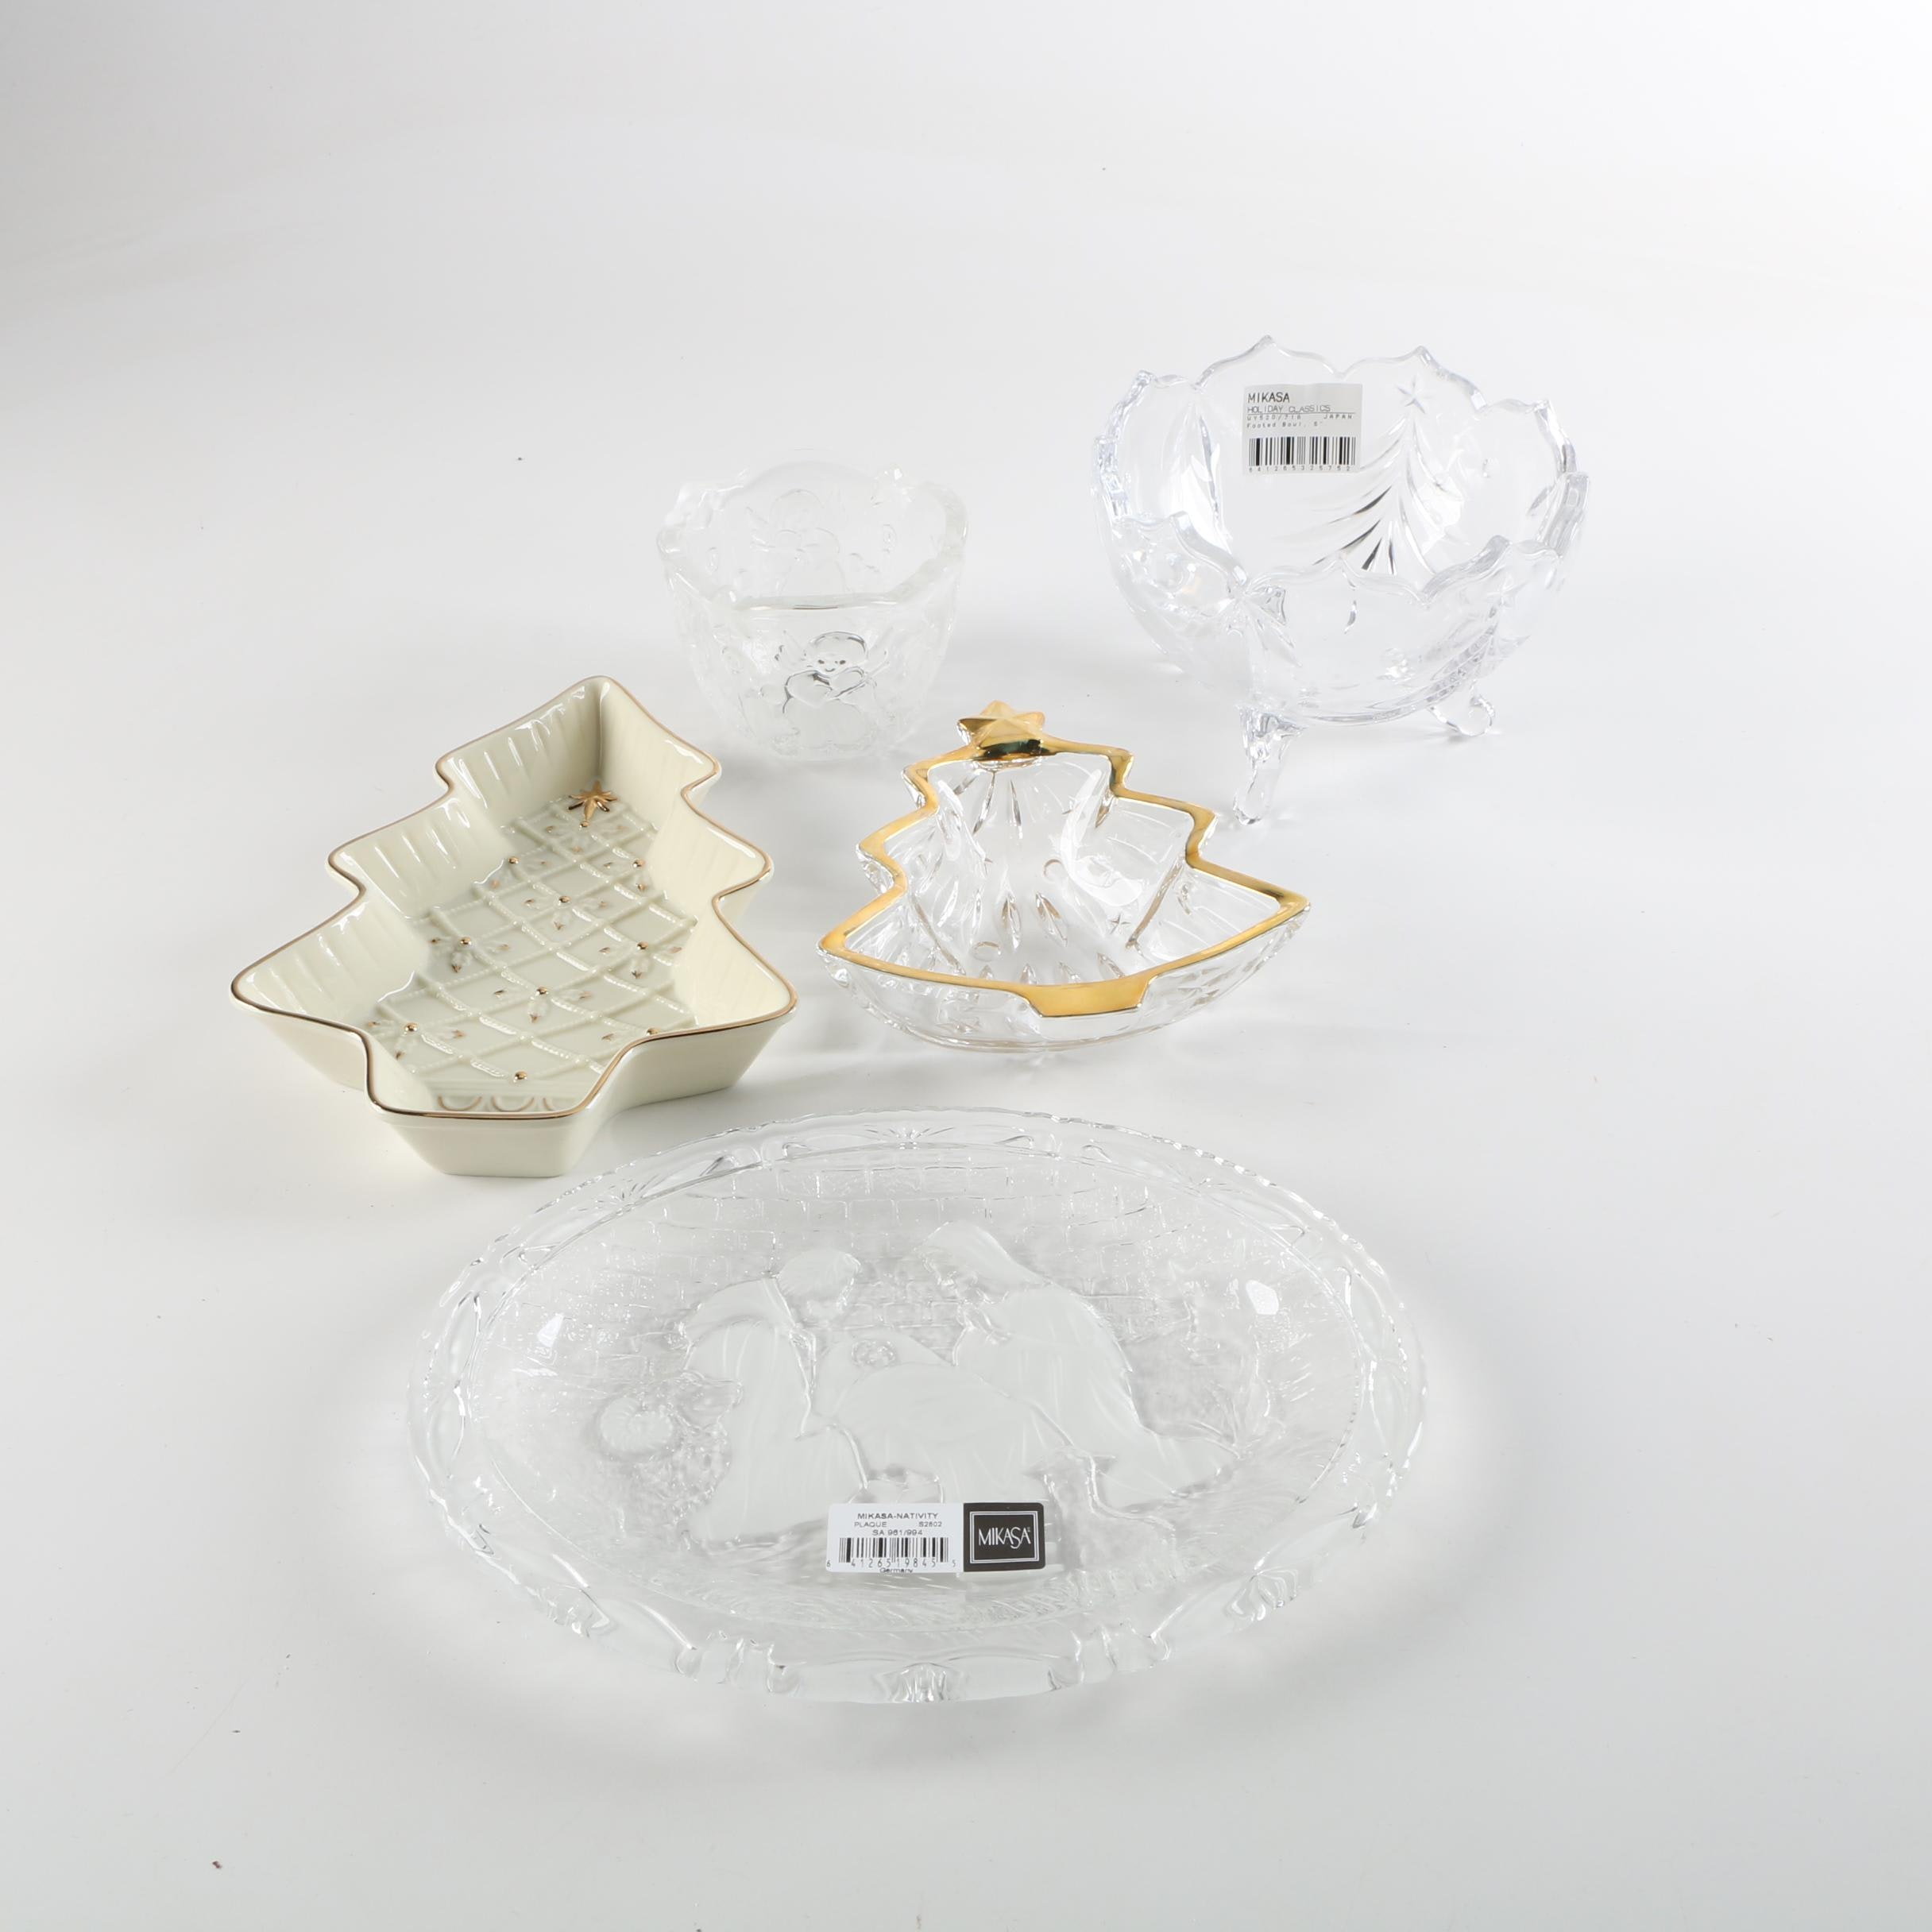 Christmas Tableware Including Mikasa and More